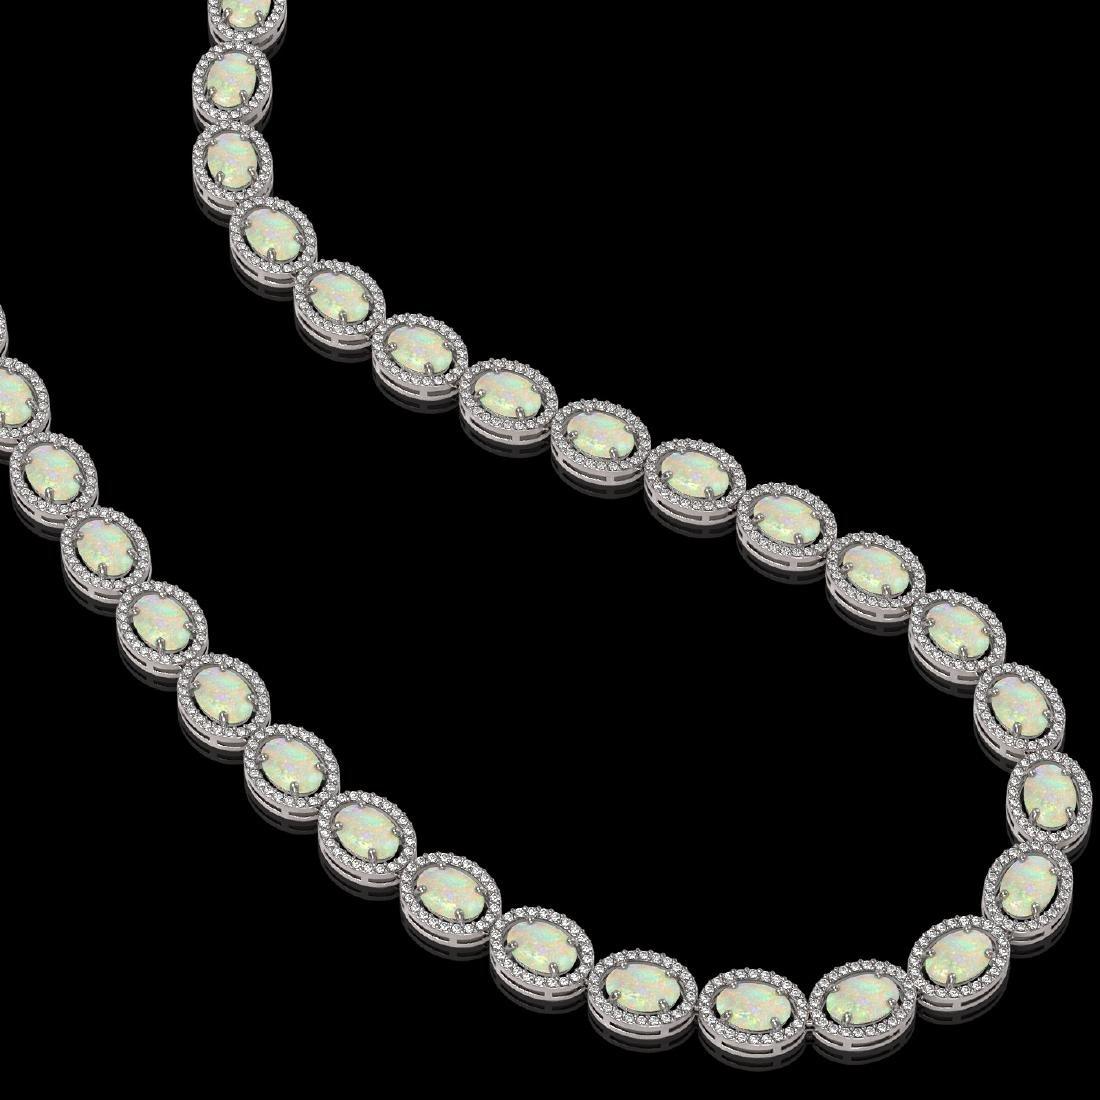 32.42 CTW Opal & Diamond Halo Necklace 10K White Gold - 2